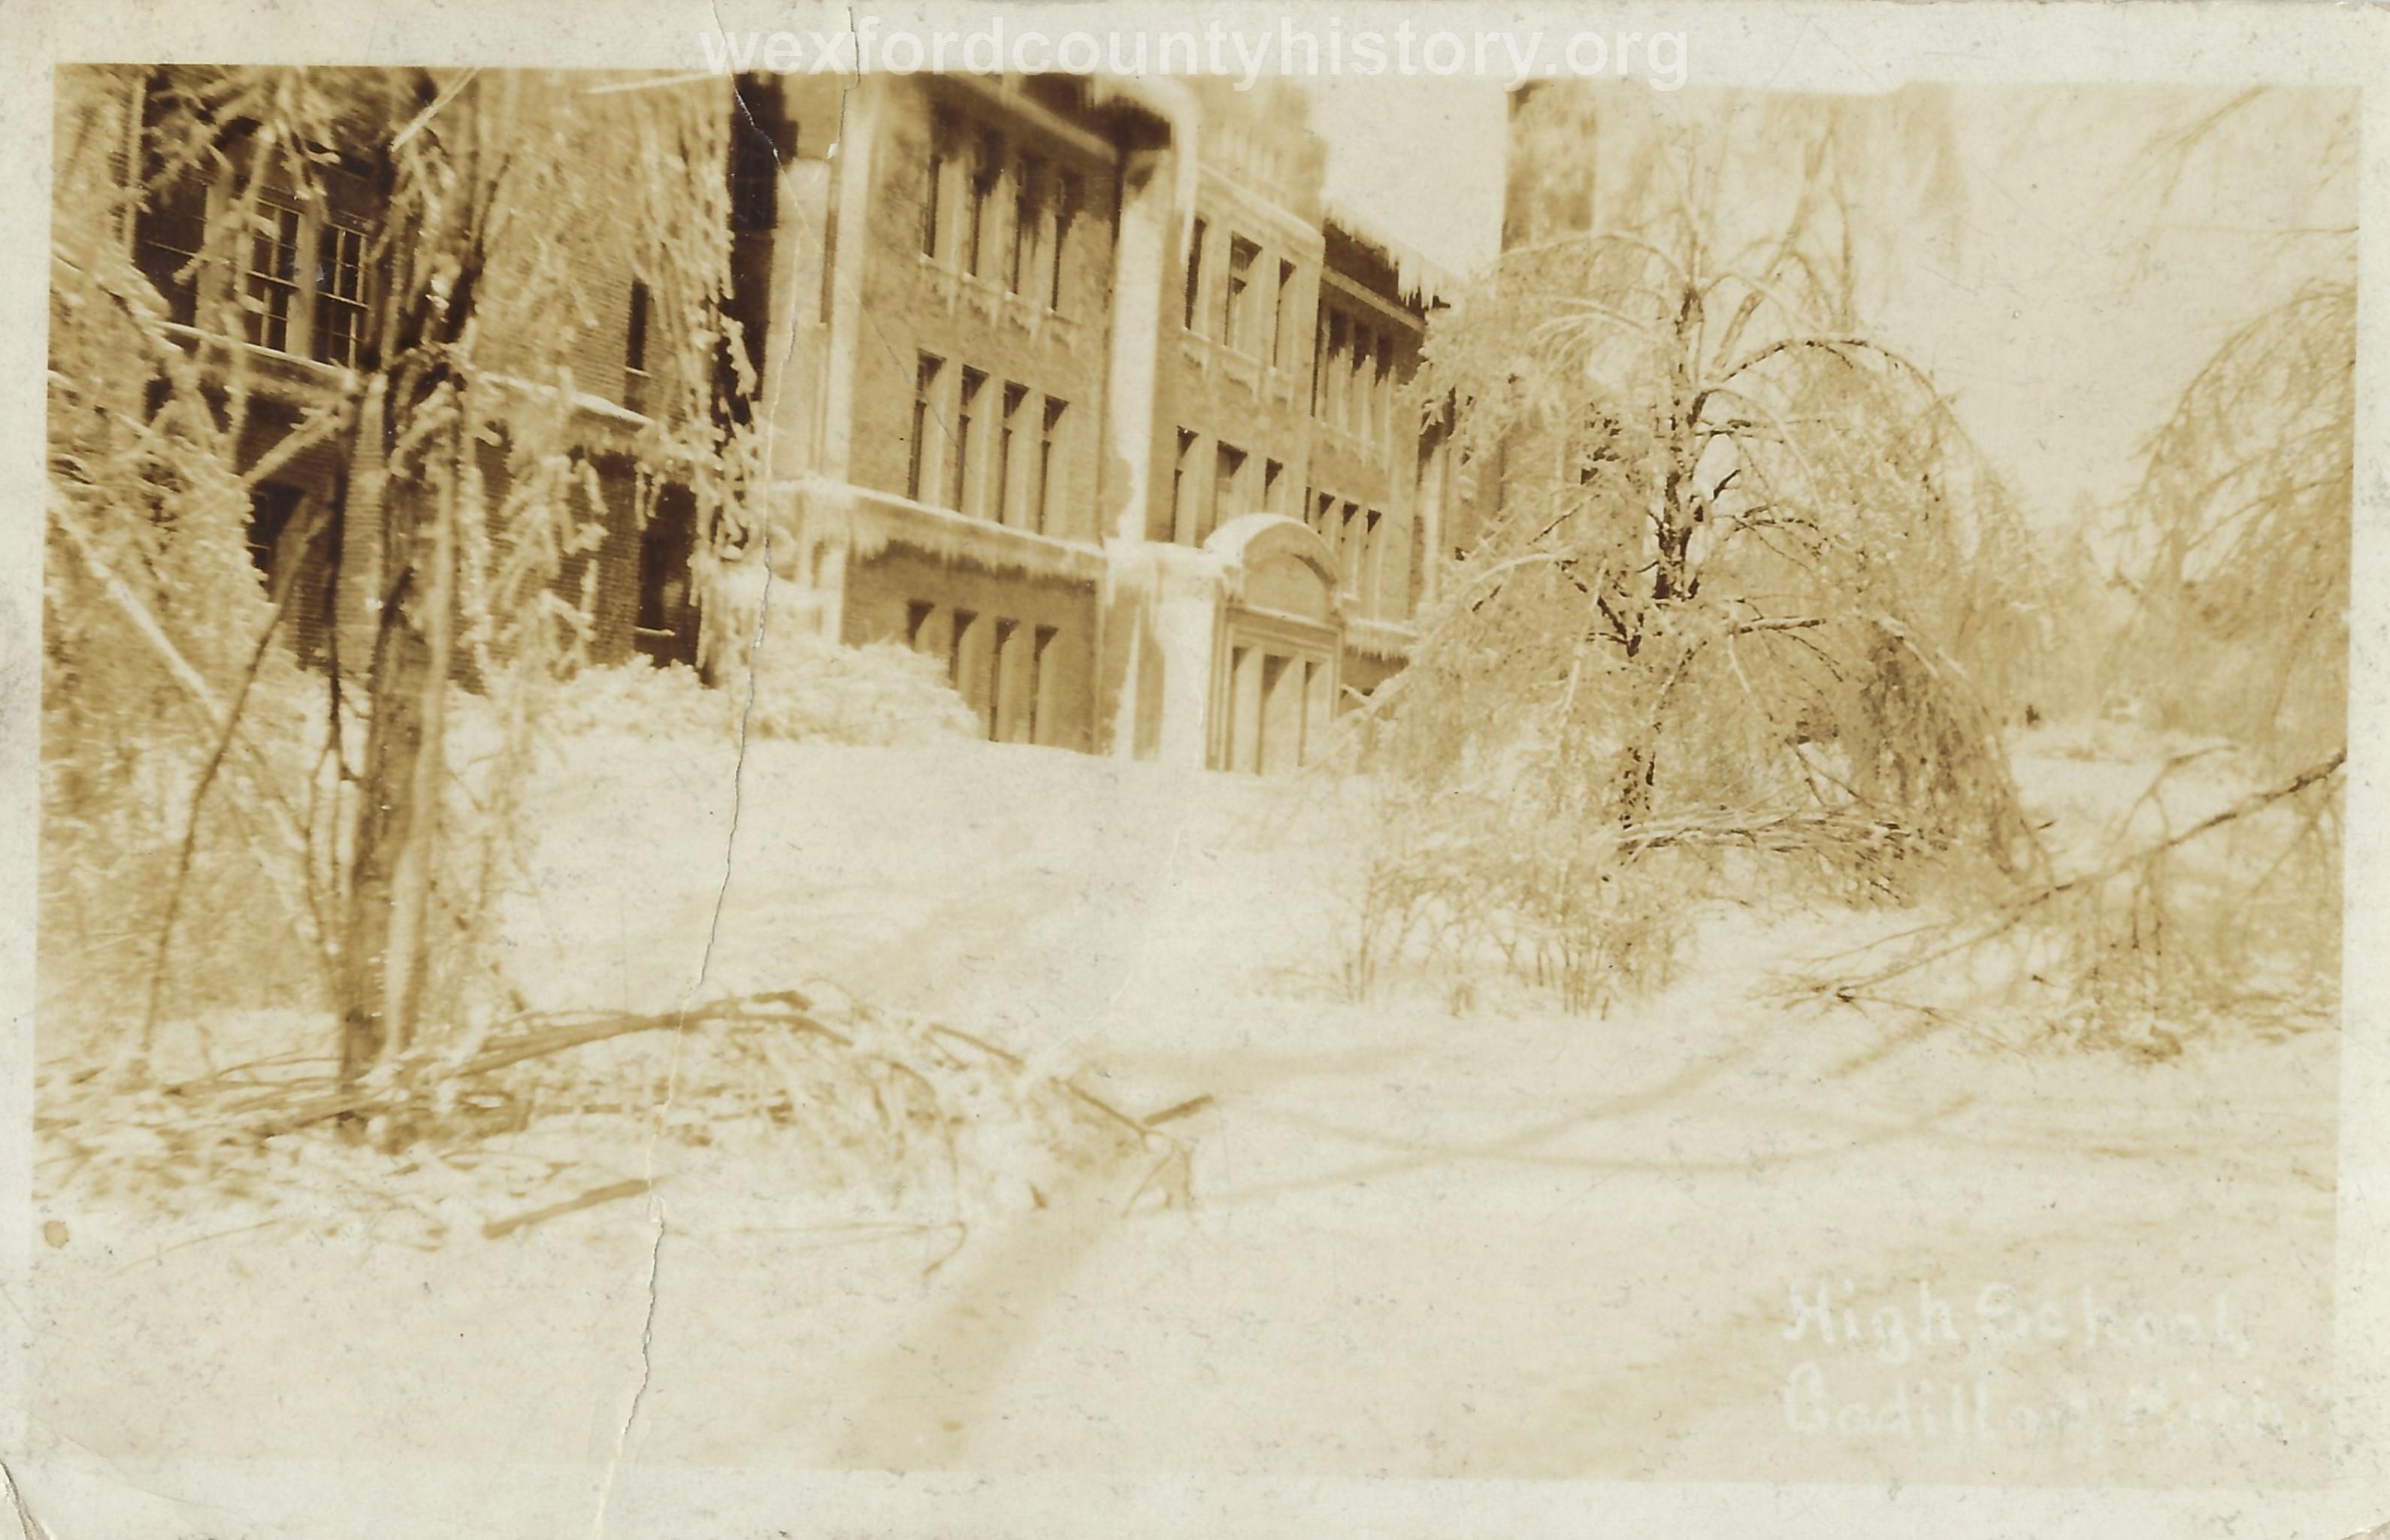 1922 Ice Storm - Old High School